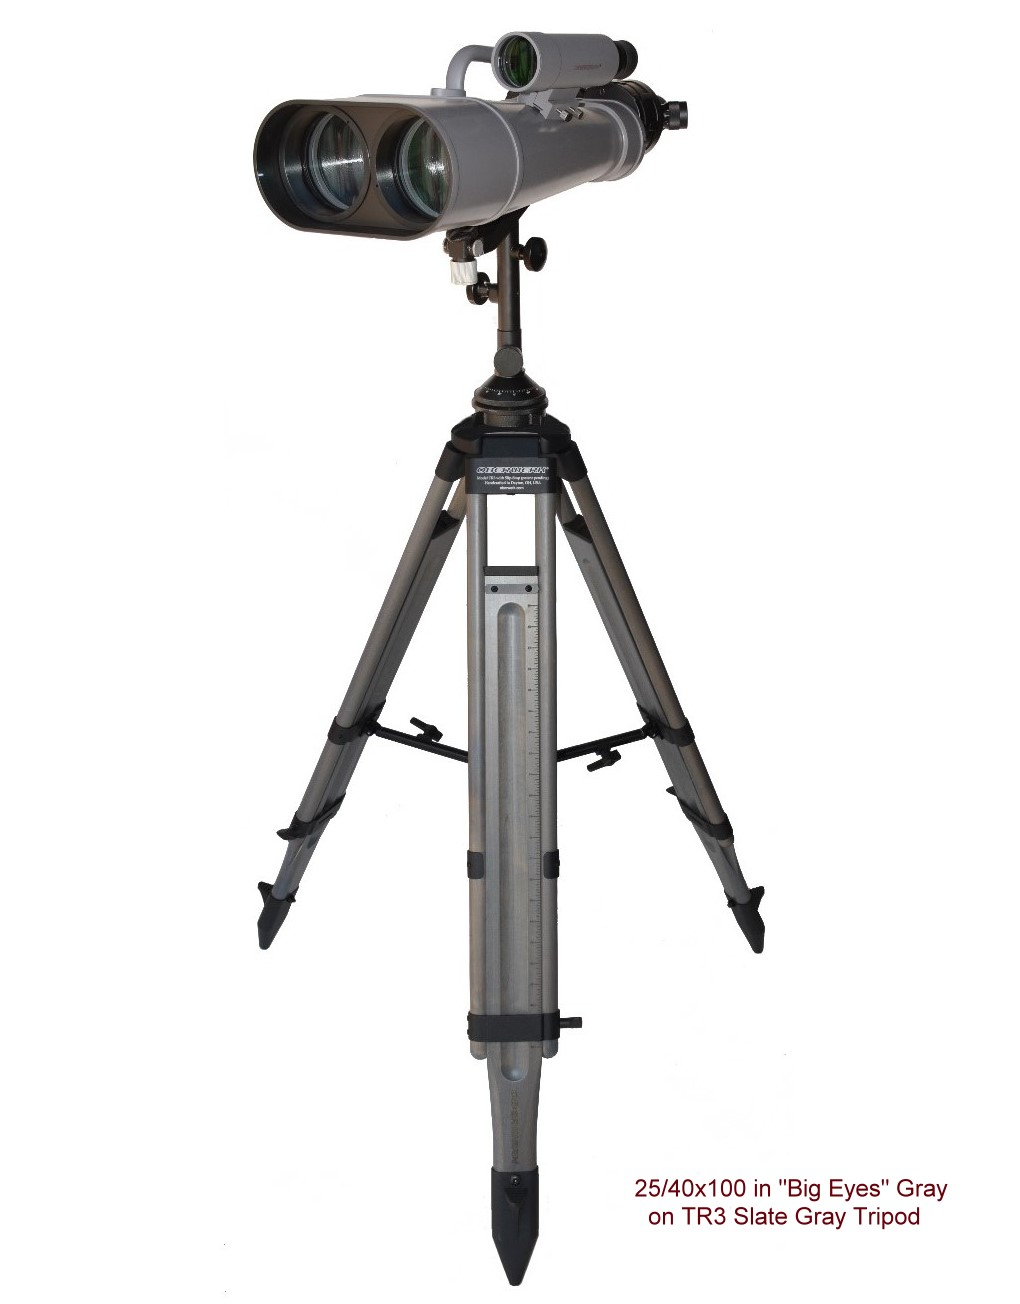 Oberwerk 25/40x100mm Long-Range Observation Binocular with ...